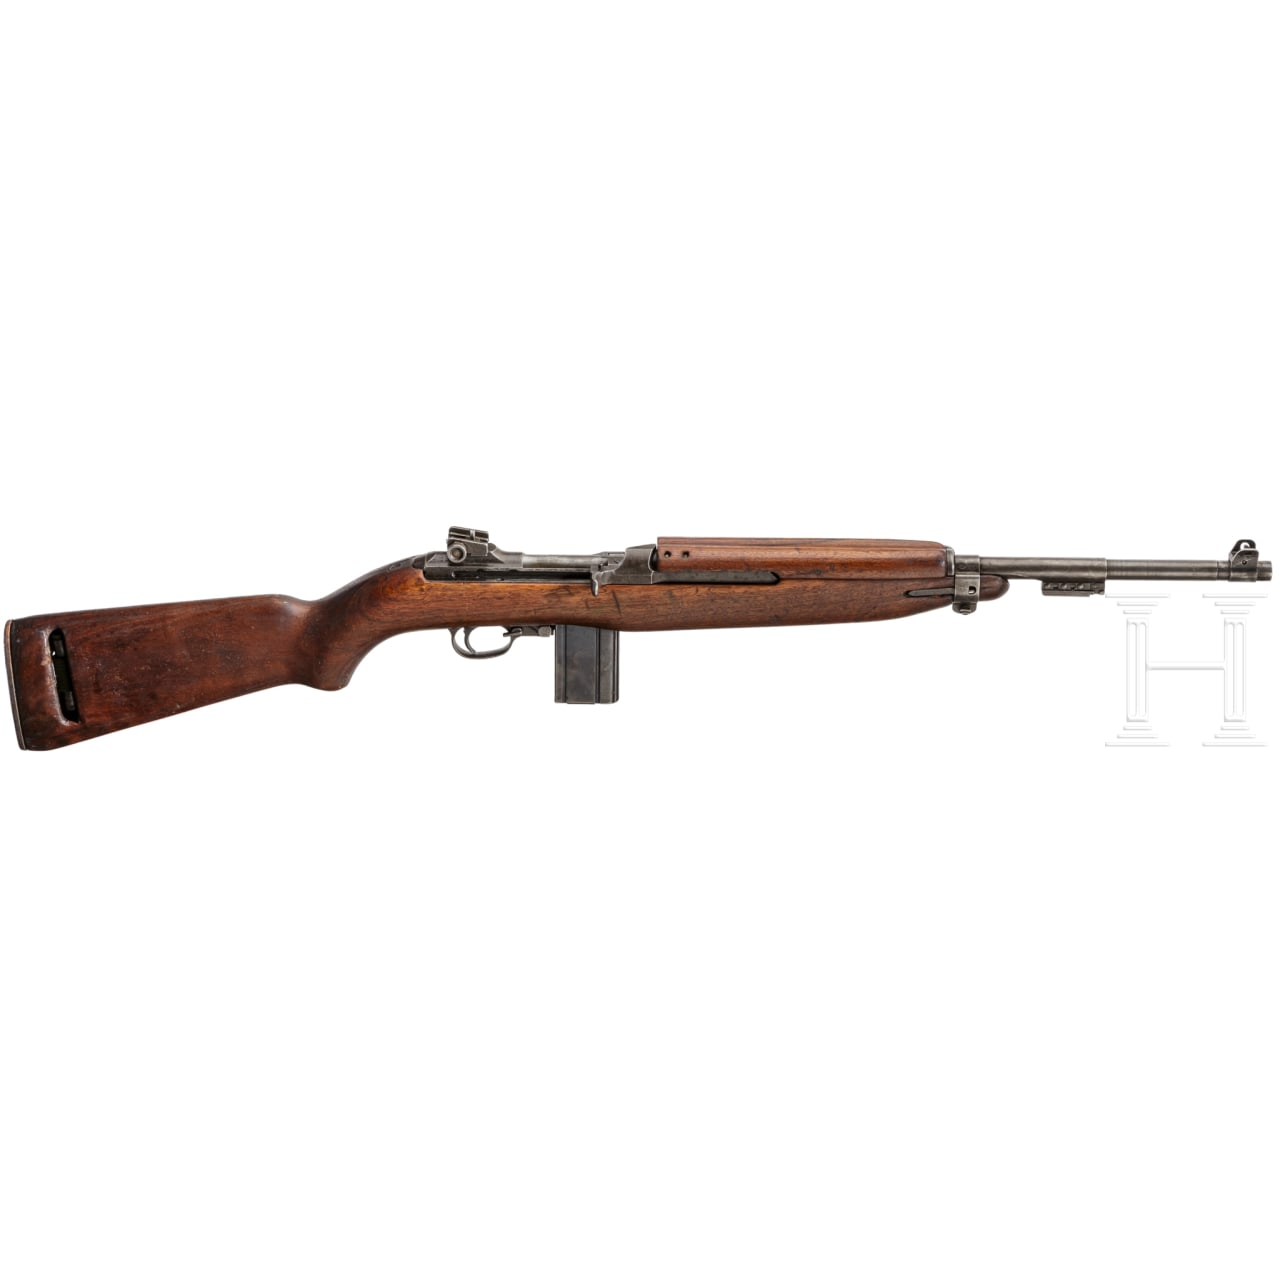 Carbine 30 M 1, Inland Div.